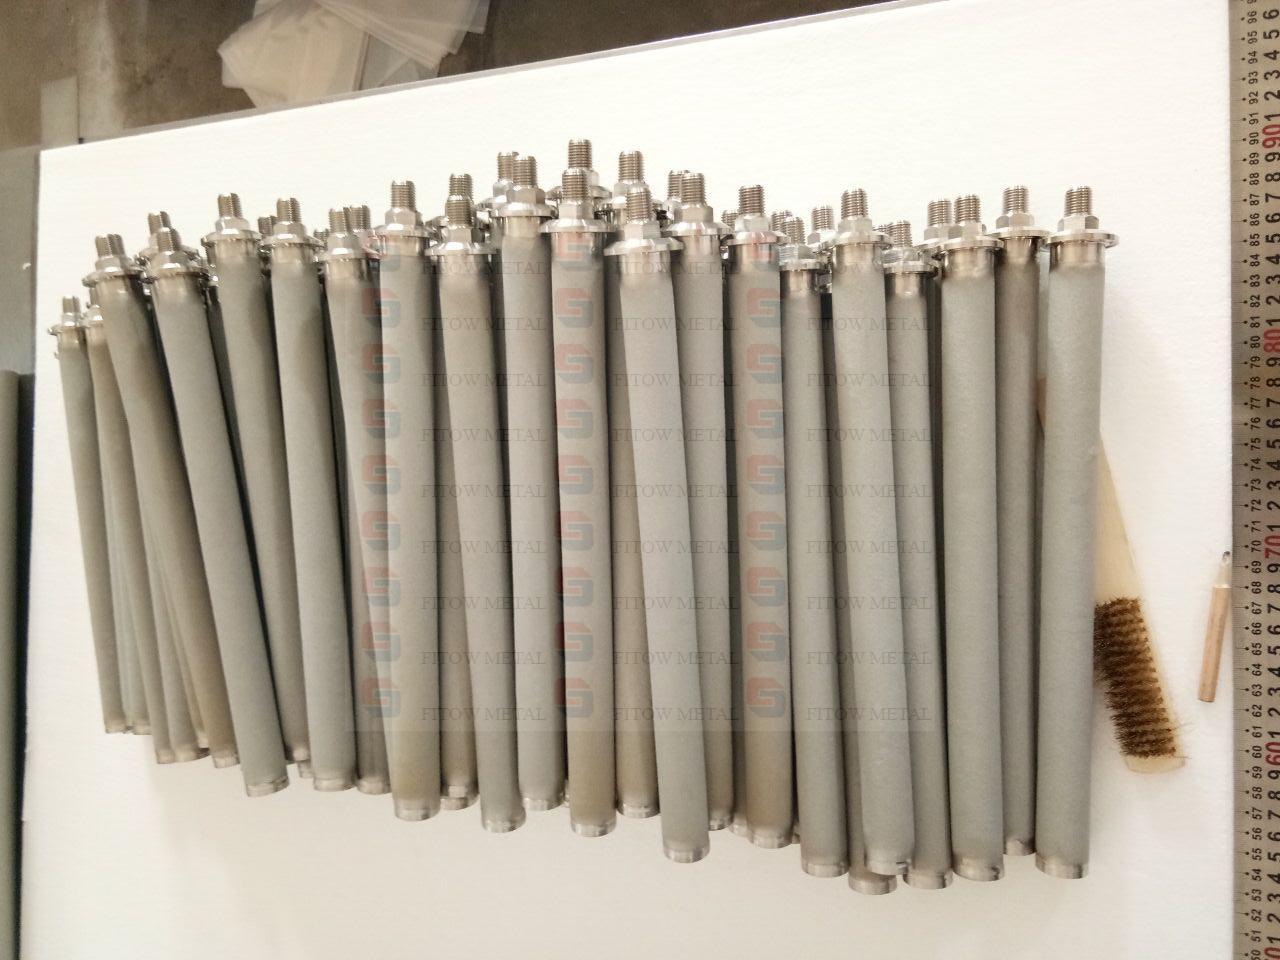 Sintered Stainless Steel Filter Elements Sintered Filter